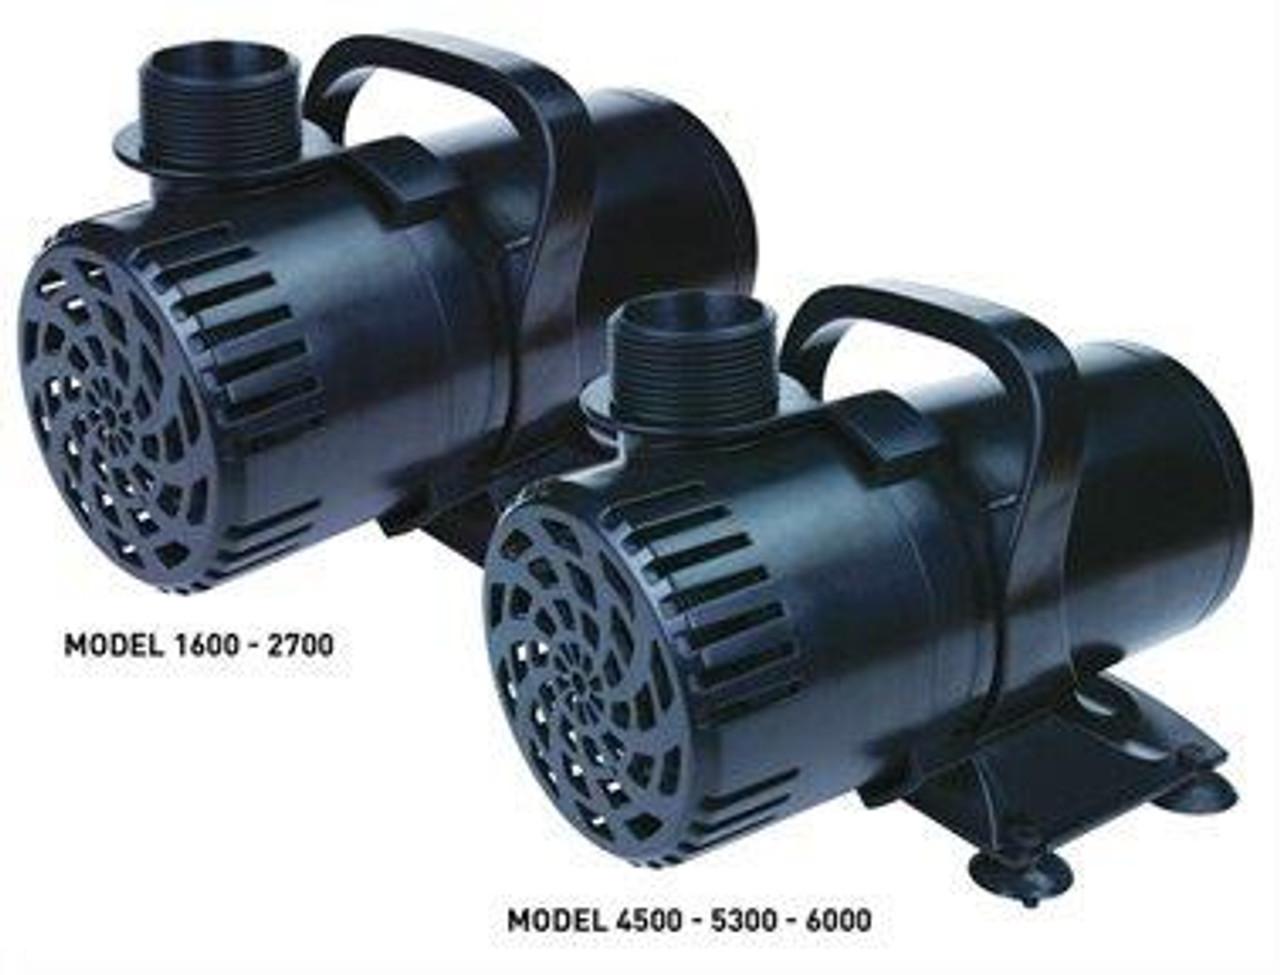 Lifegard PG Pump Model 1600 (R800000)